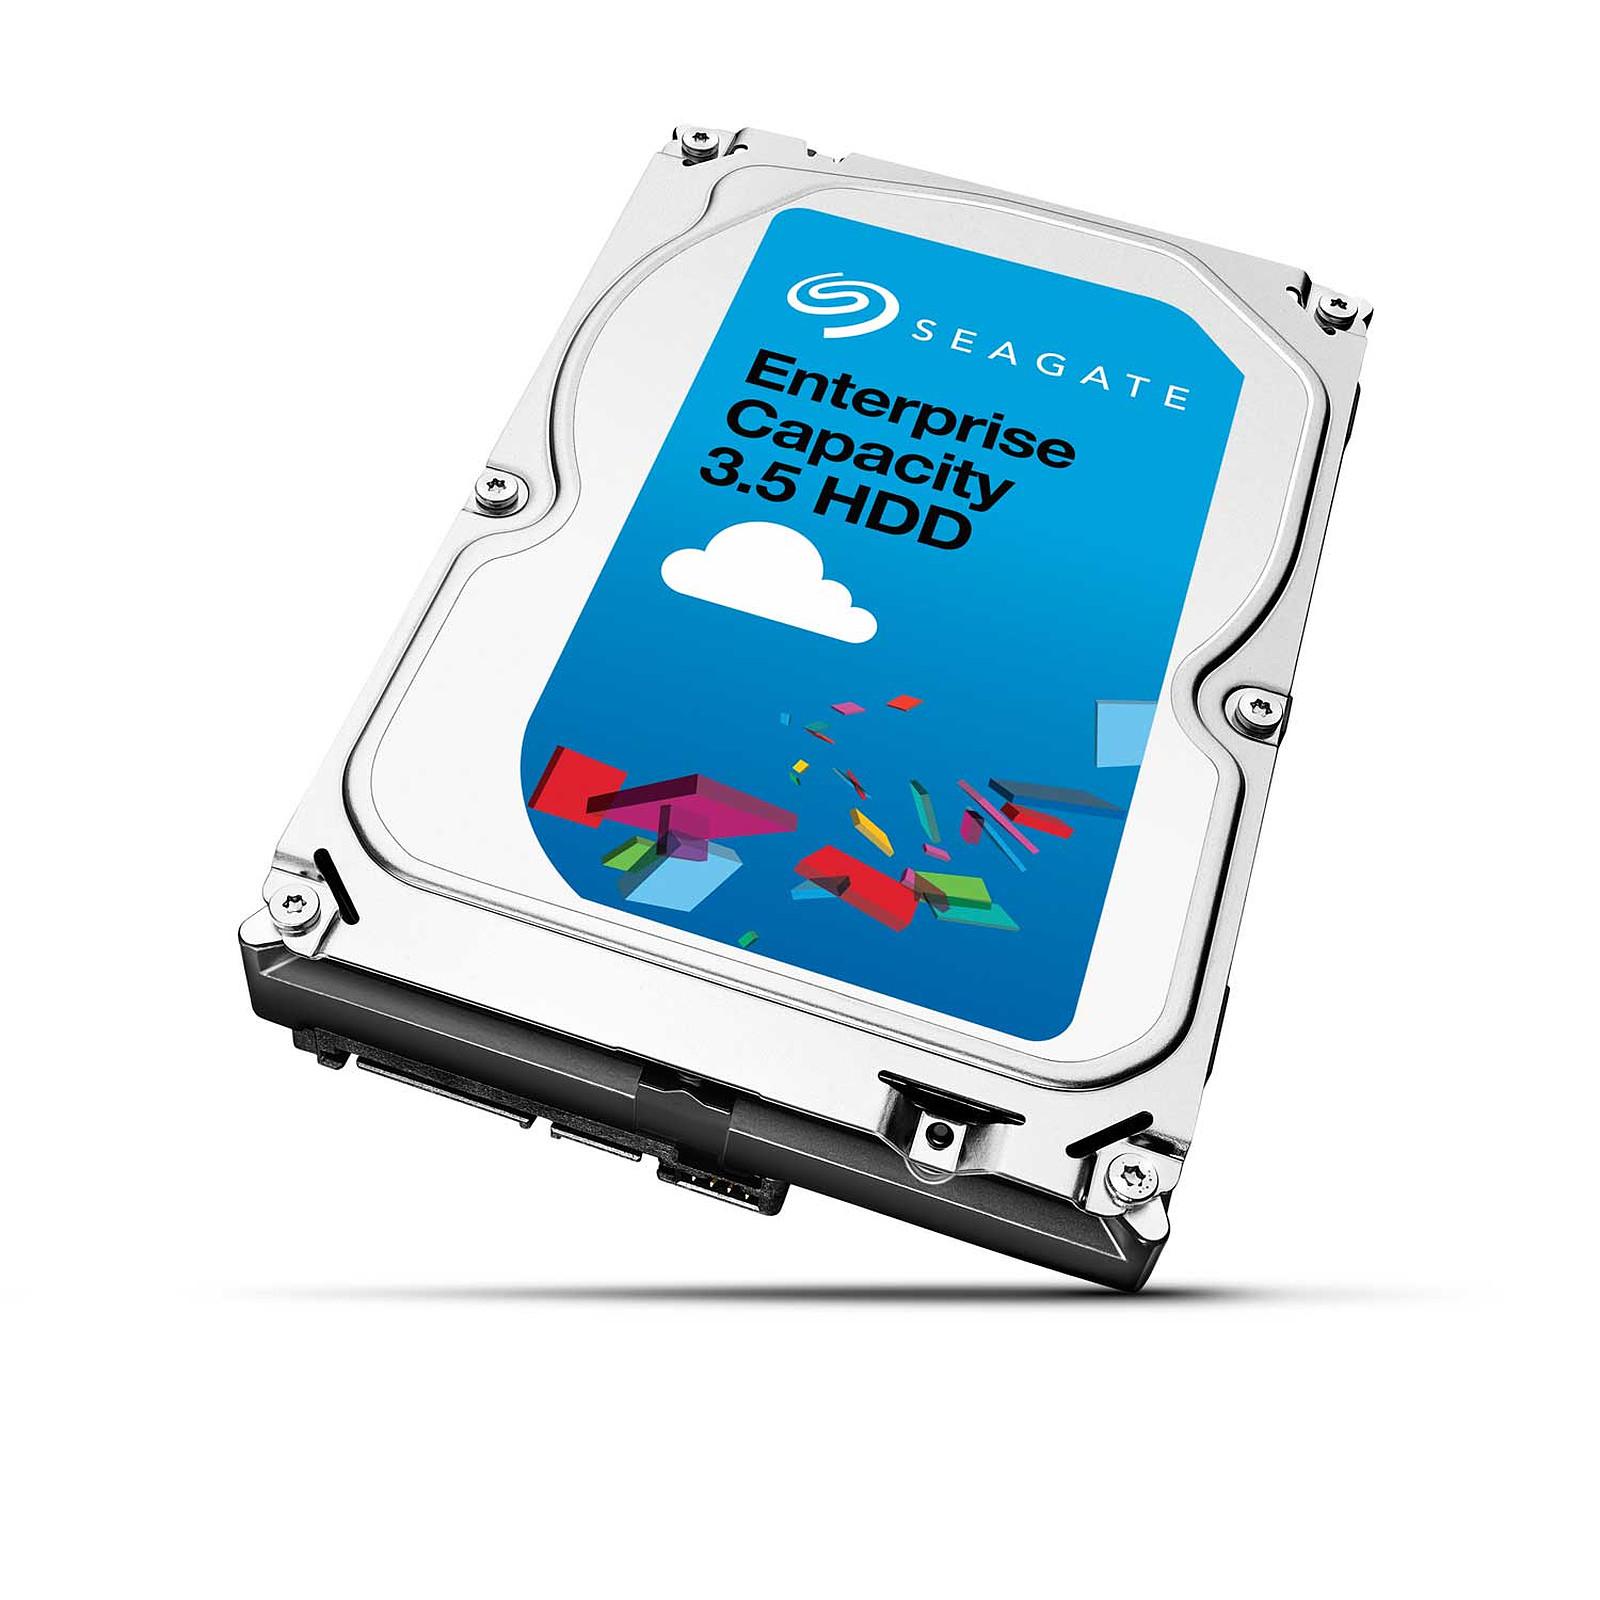 Seagate Enterprise Capacity 3.5 HDD SATA 6 Gbits/s 6 To